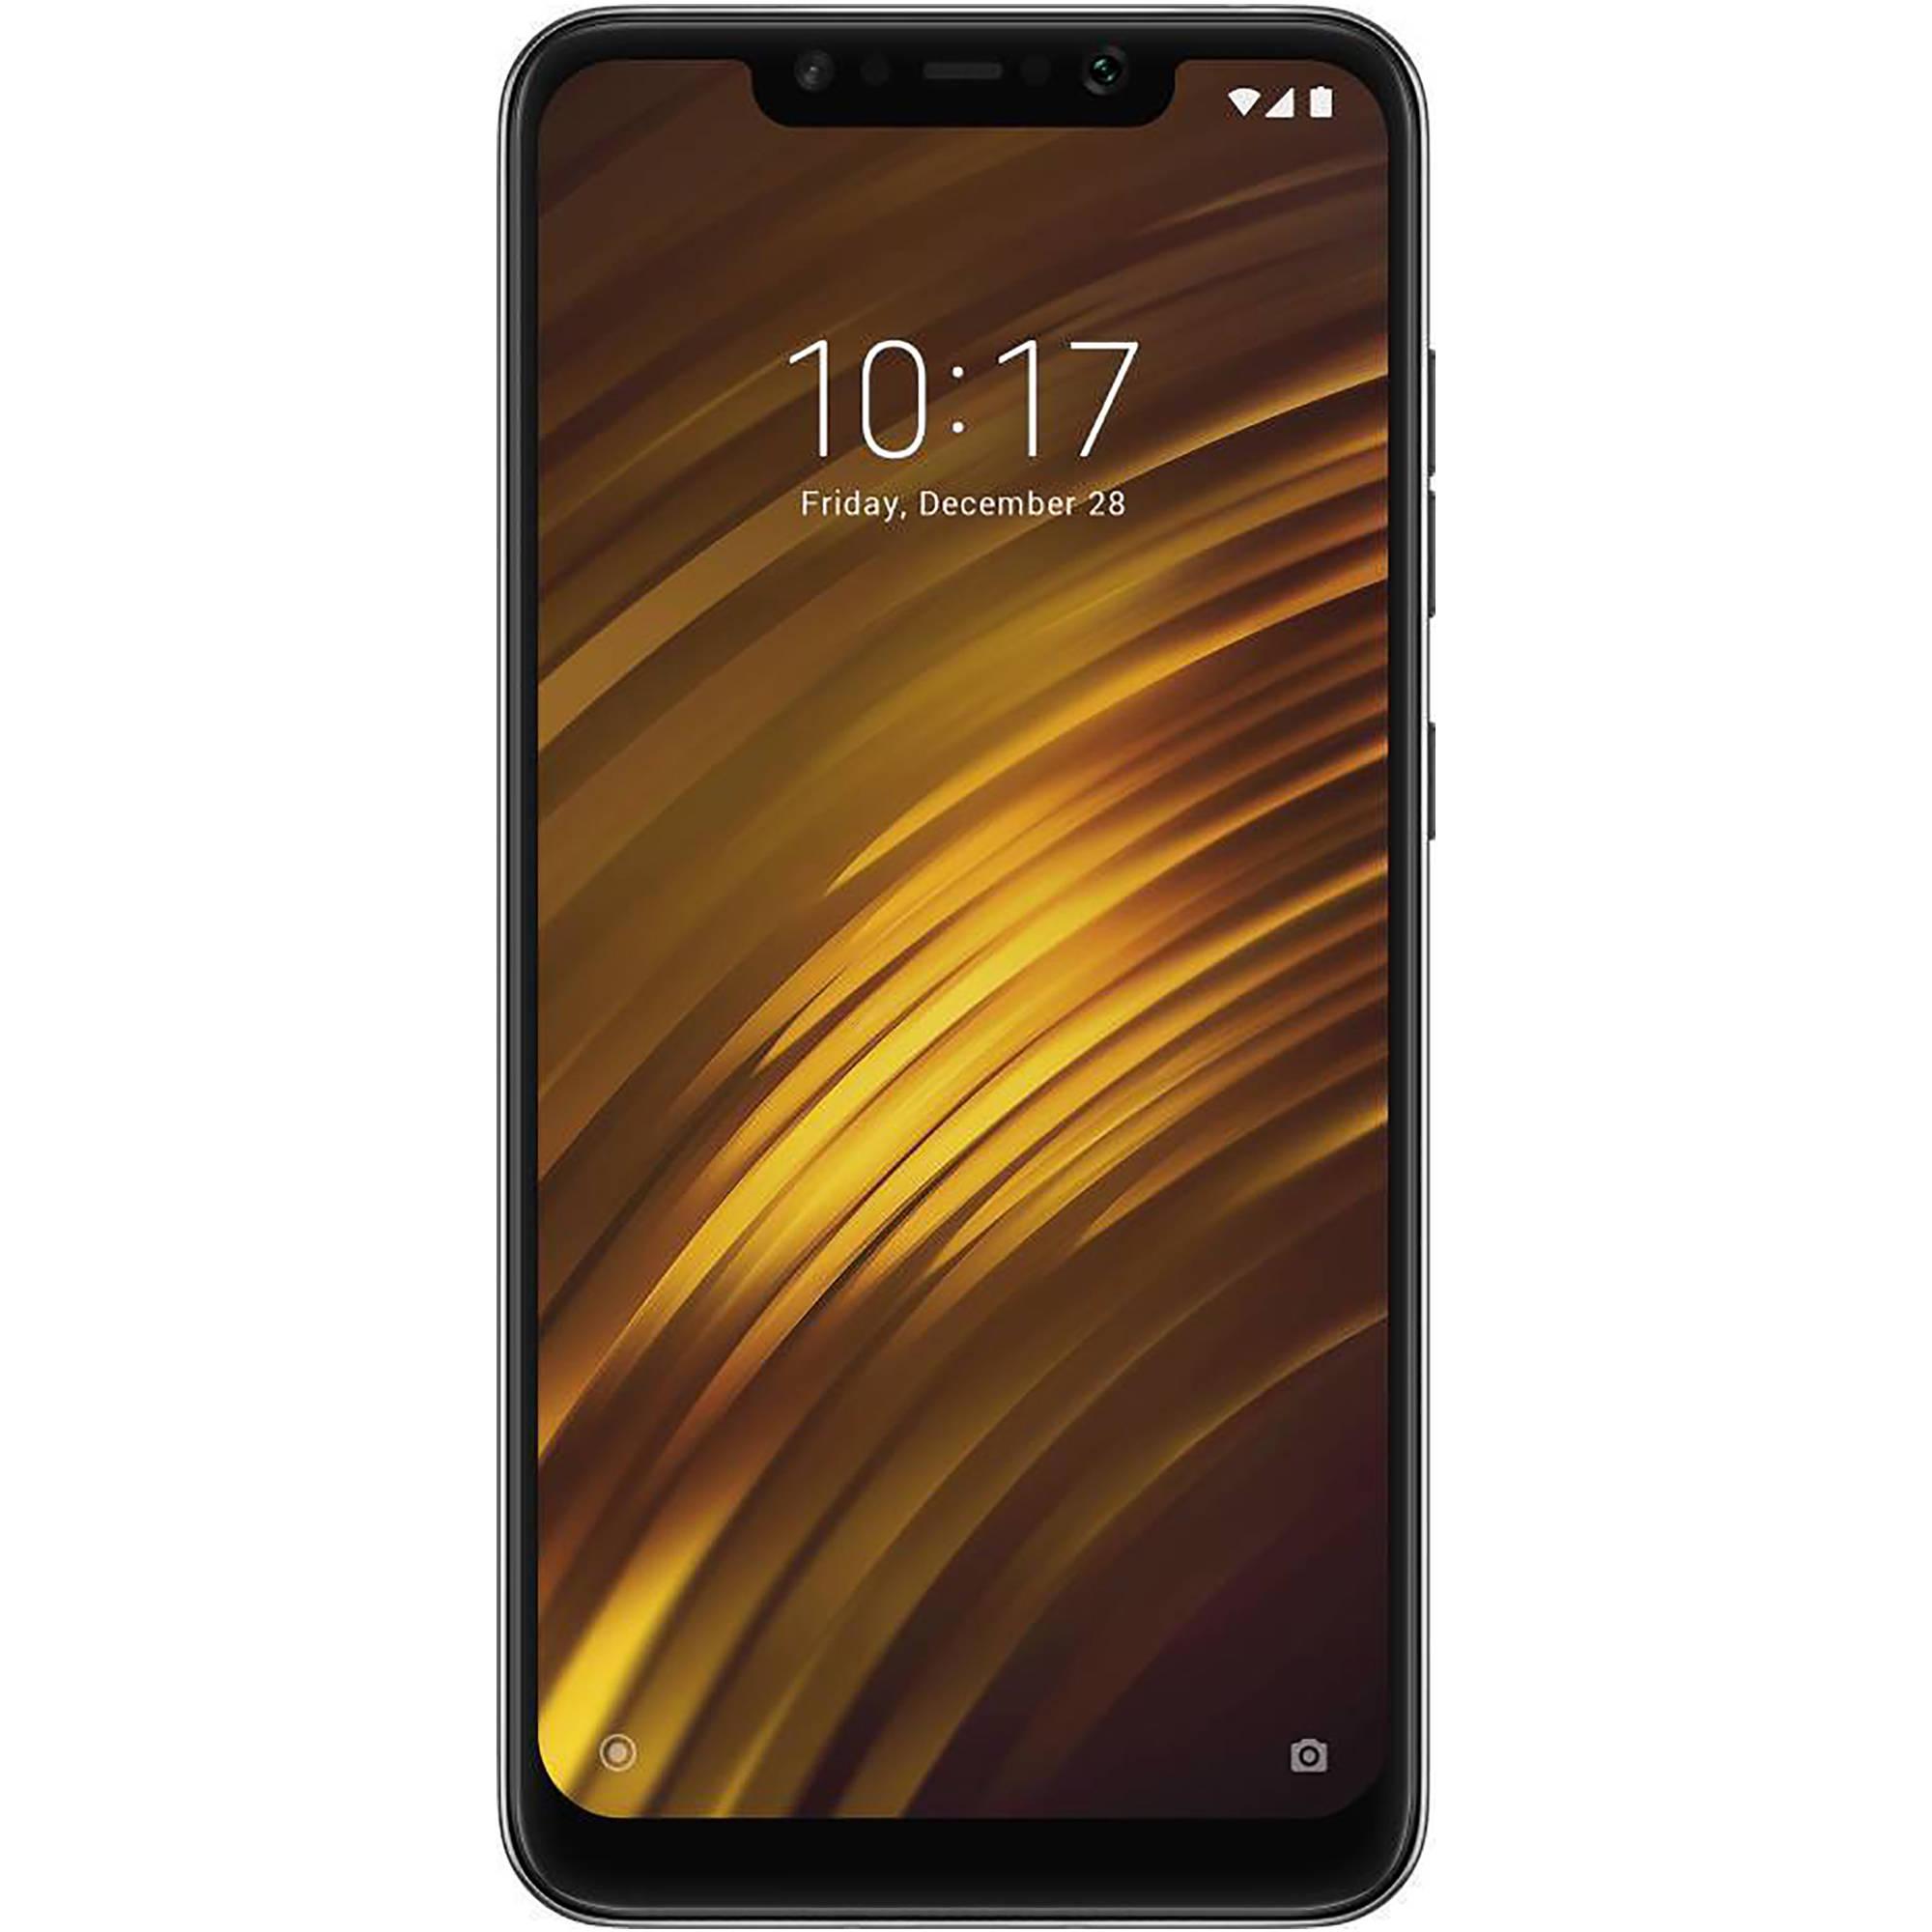 Xiaomi Pocophone F1 Dual-SIM 64GB Smartphone (Unlocked, Graphite Black)